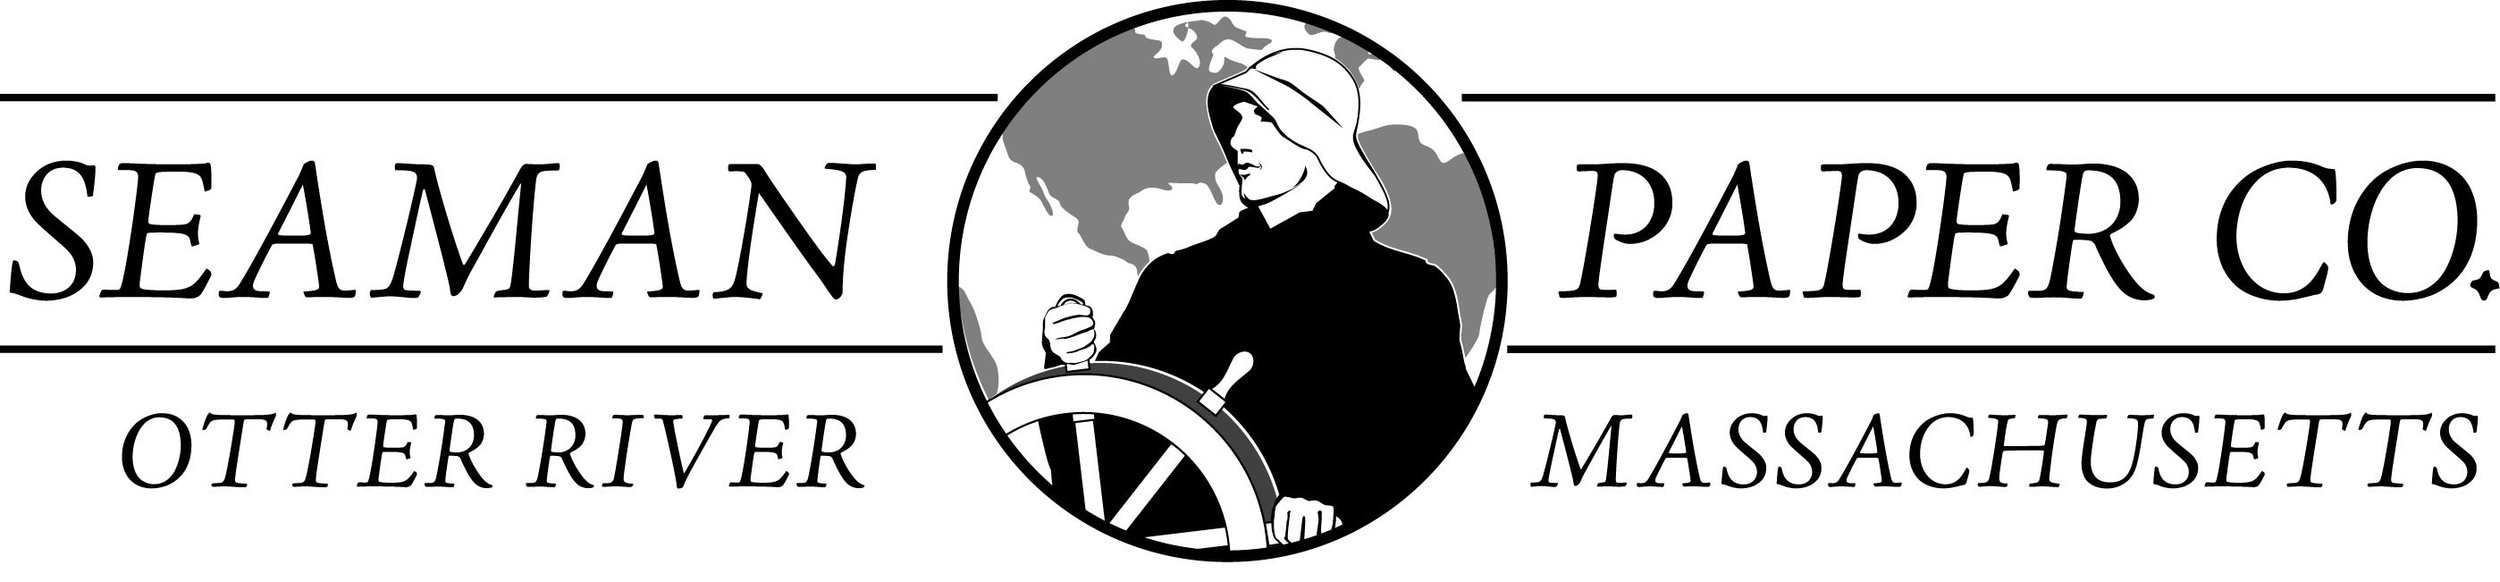 Seaman Paper Co Logo HR.jpg